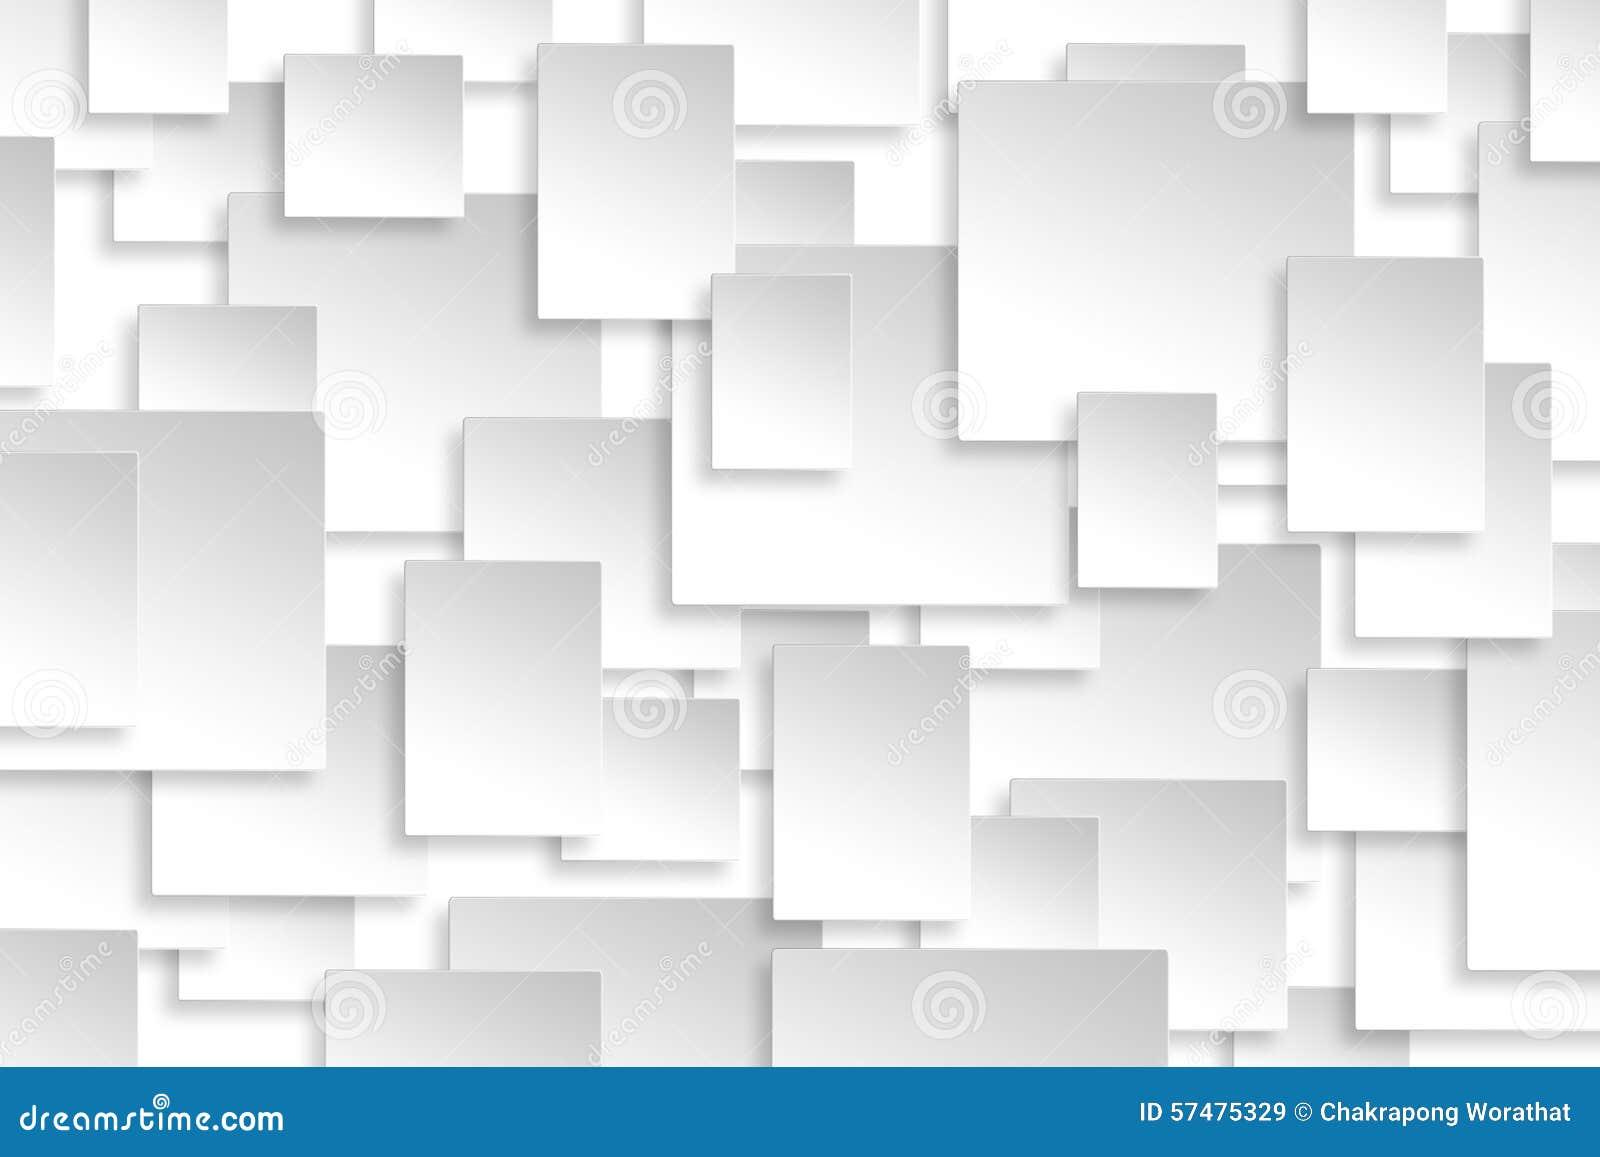 Japanese essay structure image 4